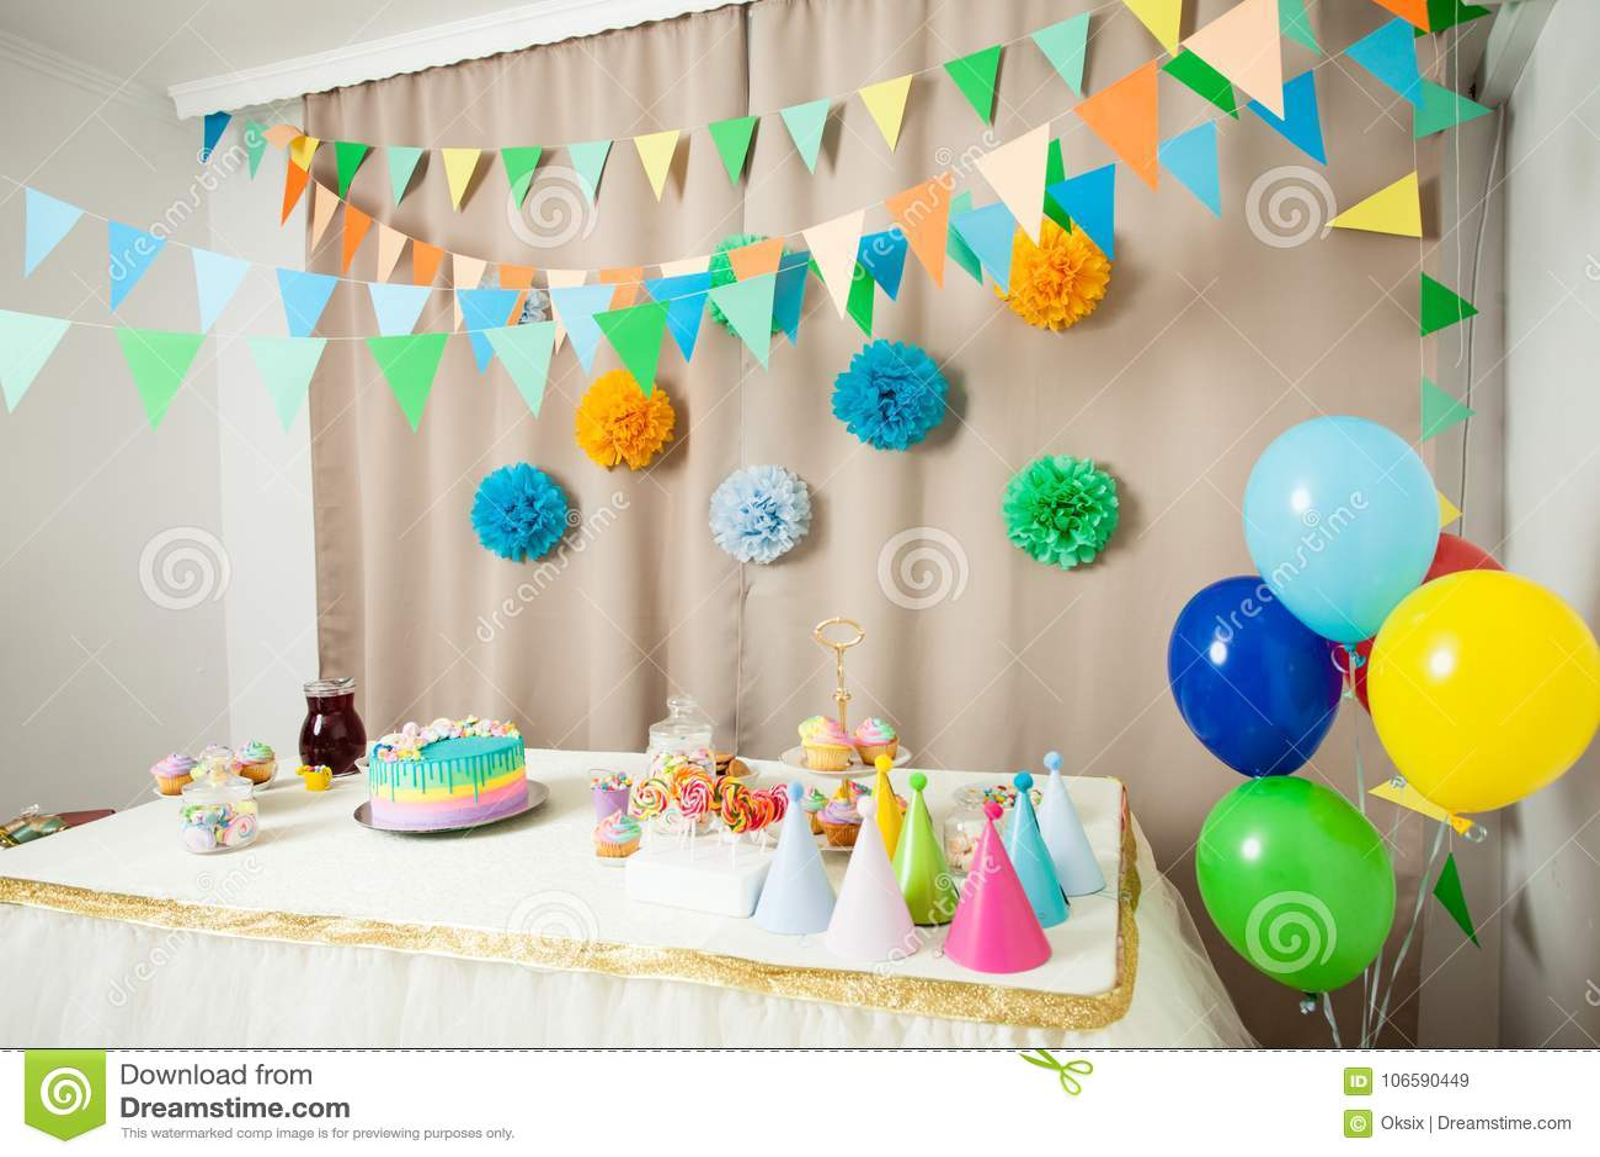 Happy Birthday Decoration Stock Image Image Of Holiday 106590449